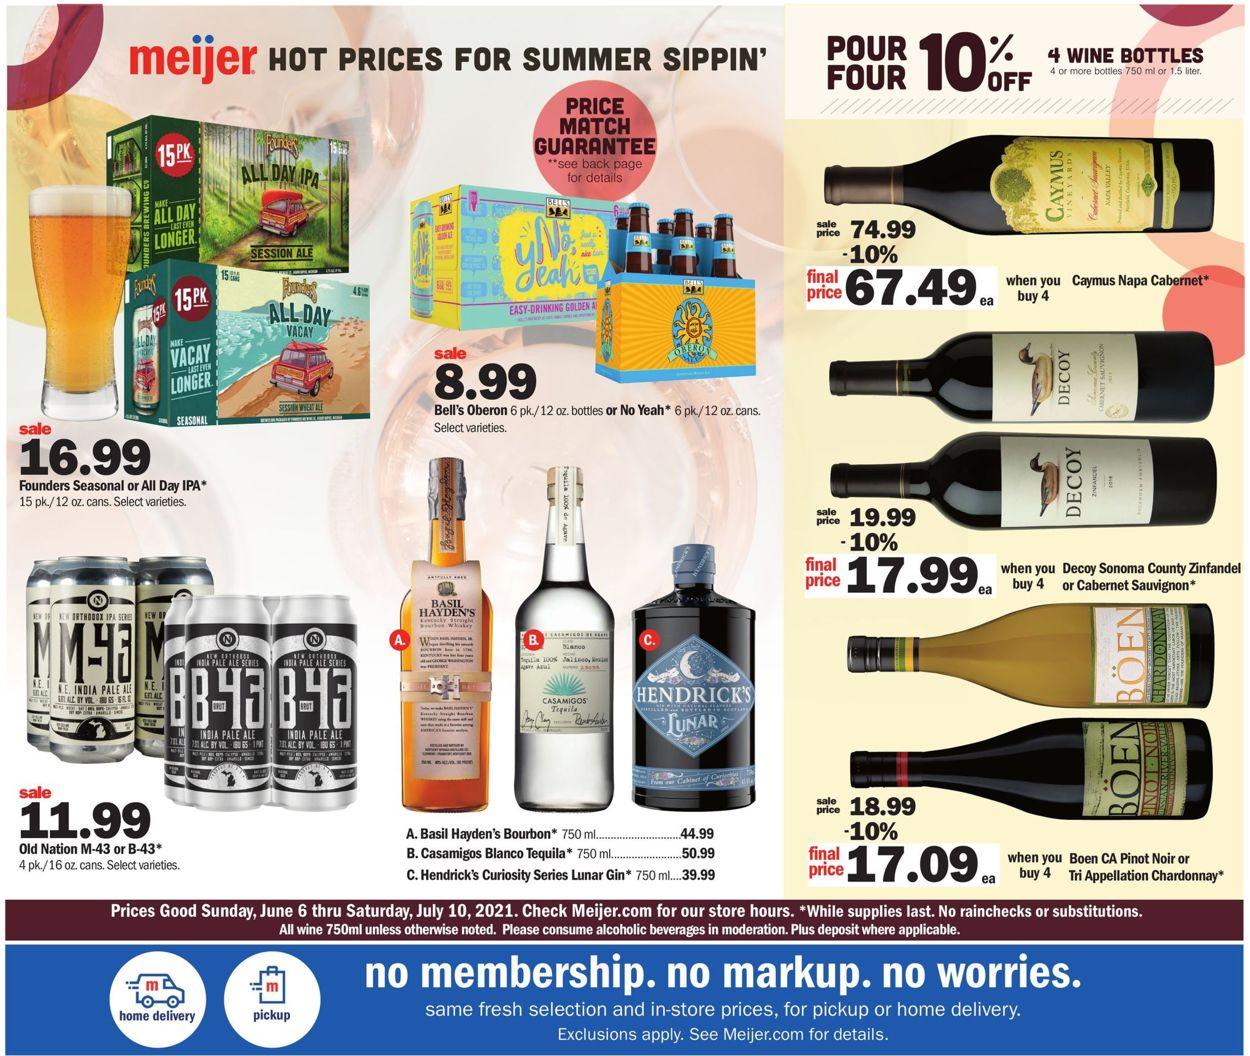 Meijer Weekly Ad Circular - valid 06/06-07/10/2021